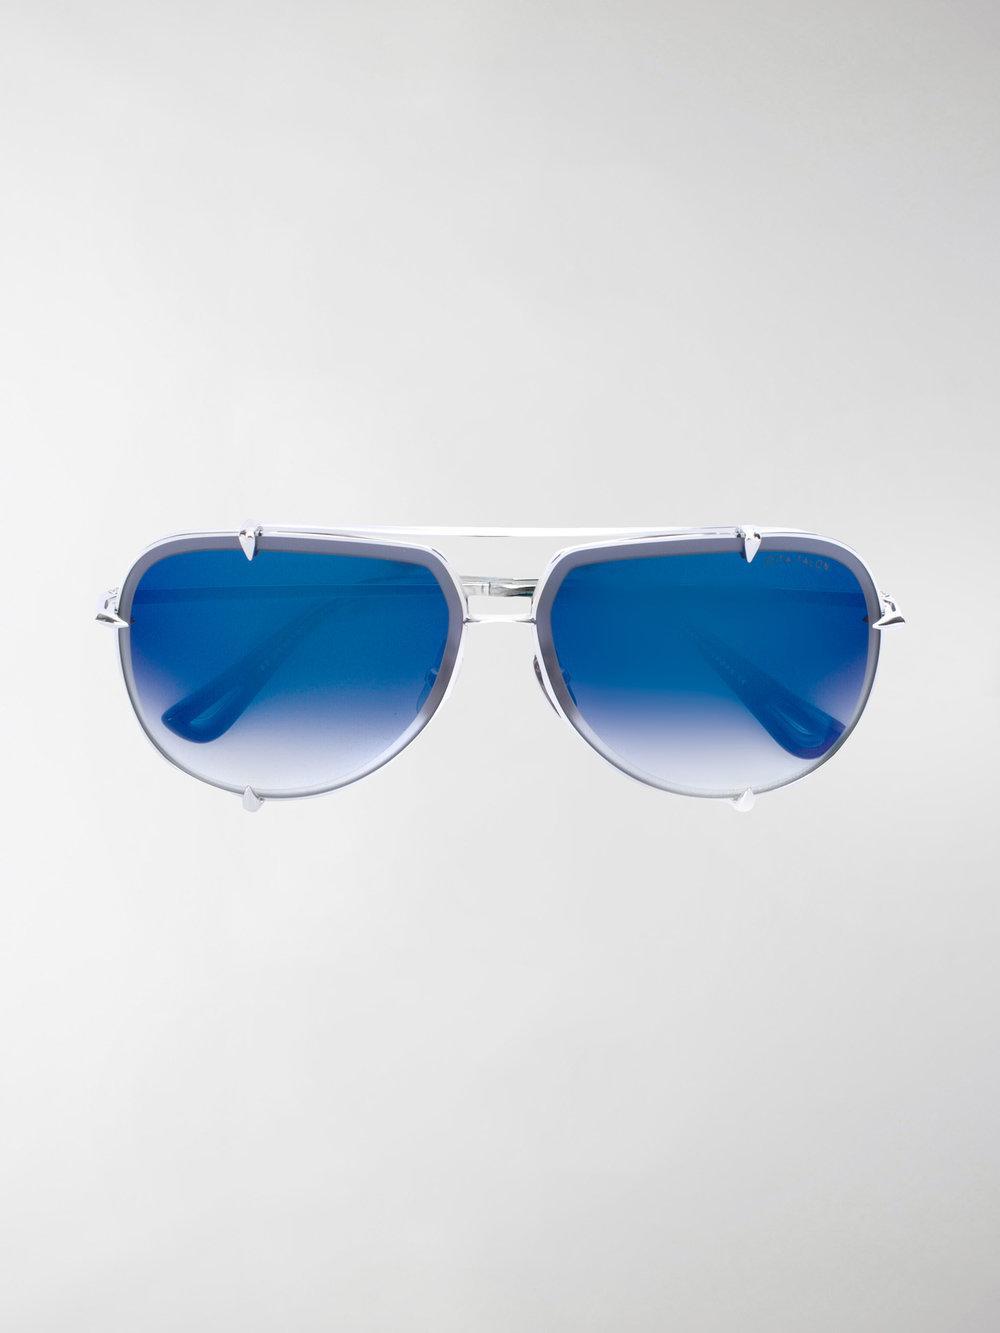 99d215d2372c Dita Eyewear Occhiali Da Sole Talon in Gray for Men - Lyst